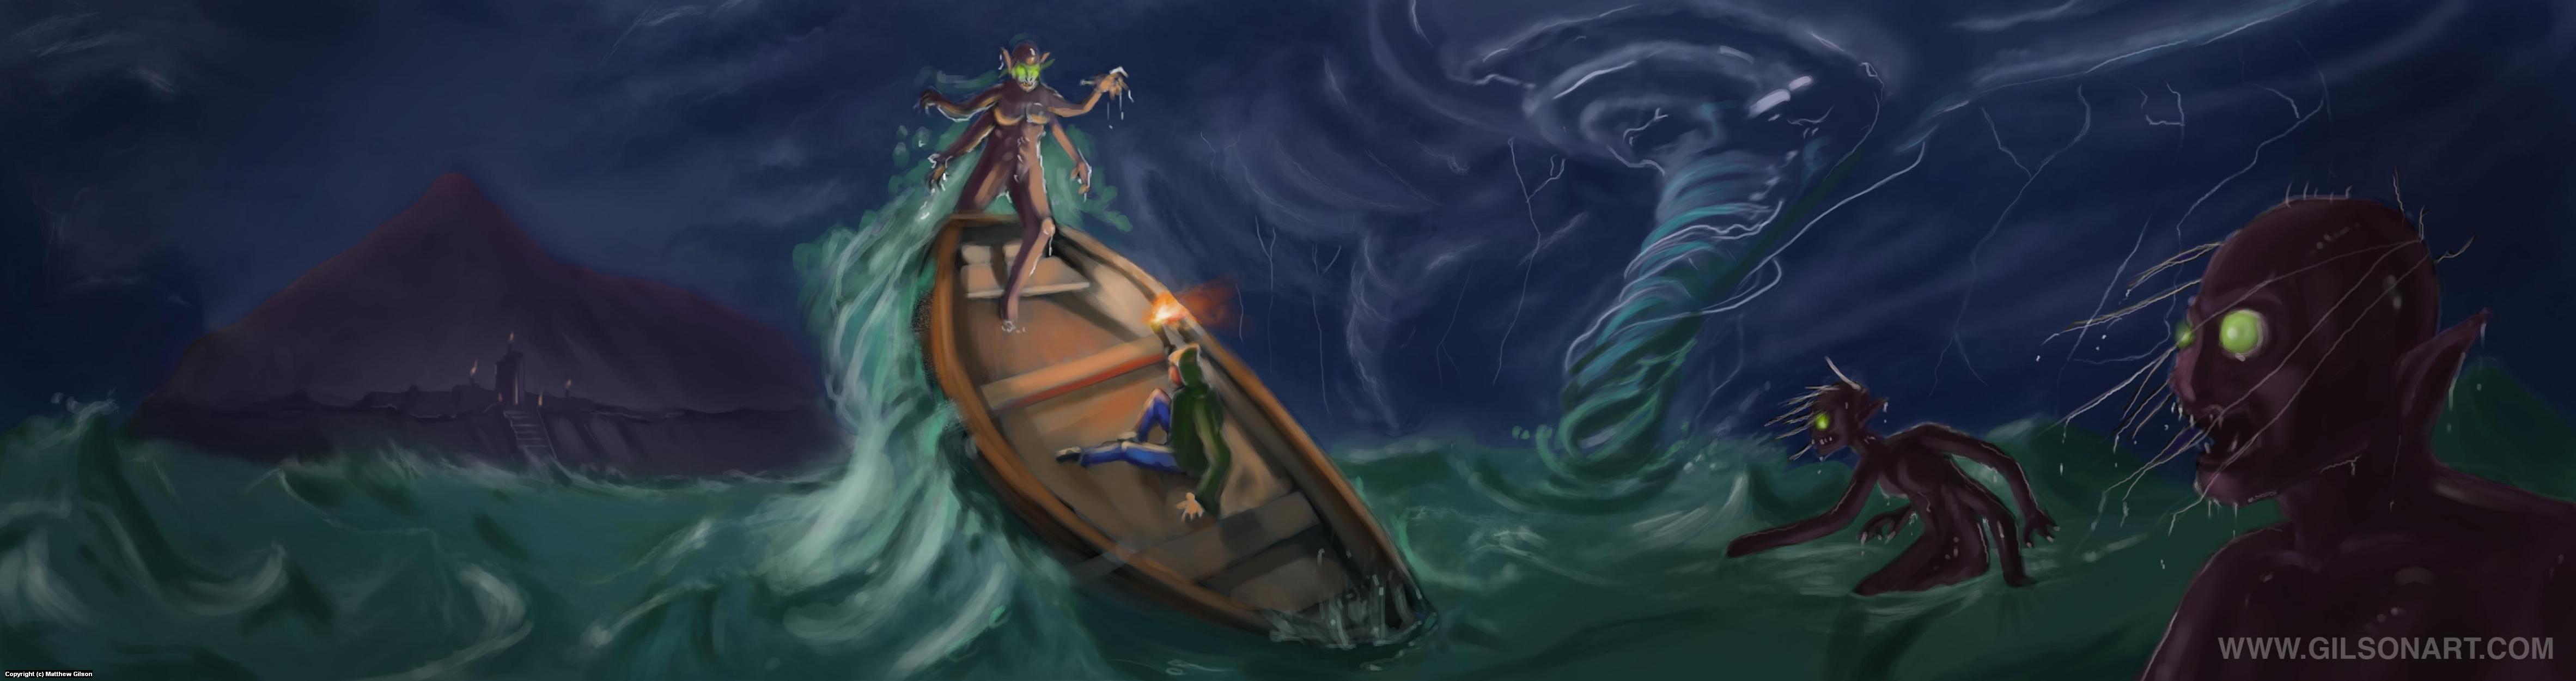 Doom of The Sea Artwork by Matthew Gilson